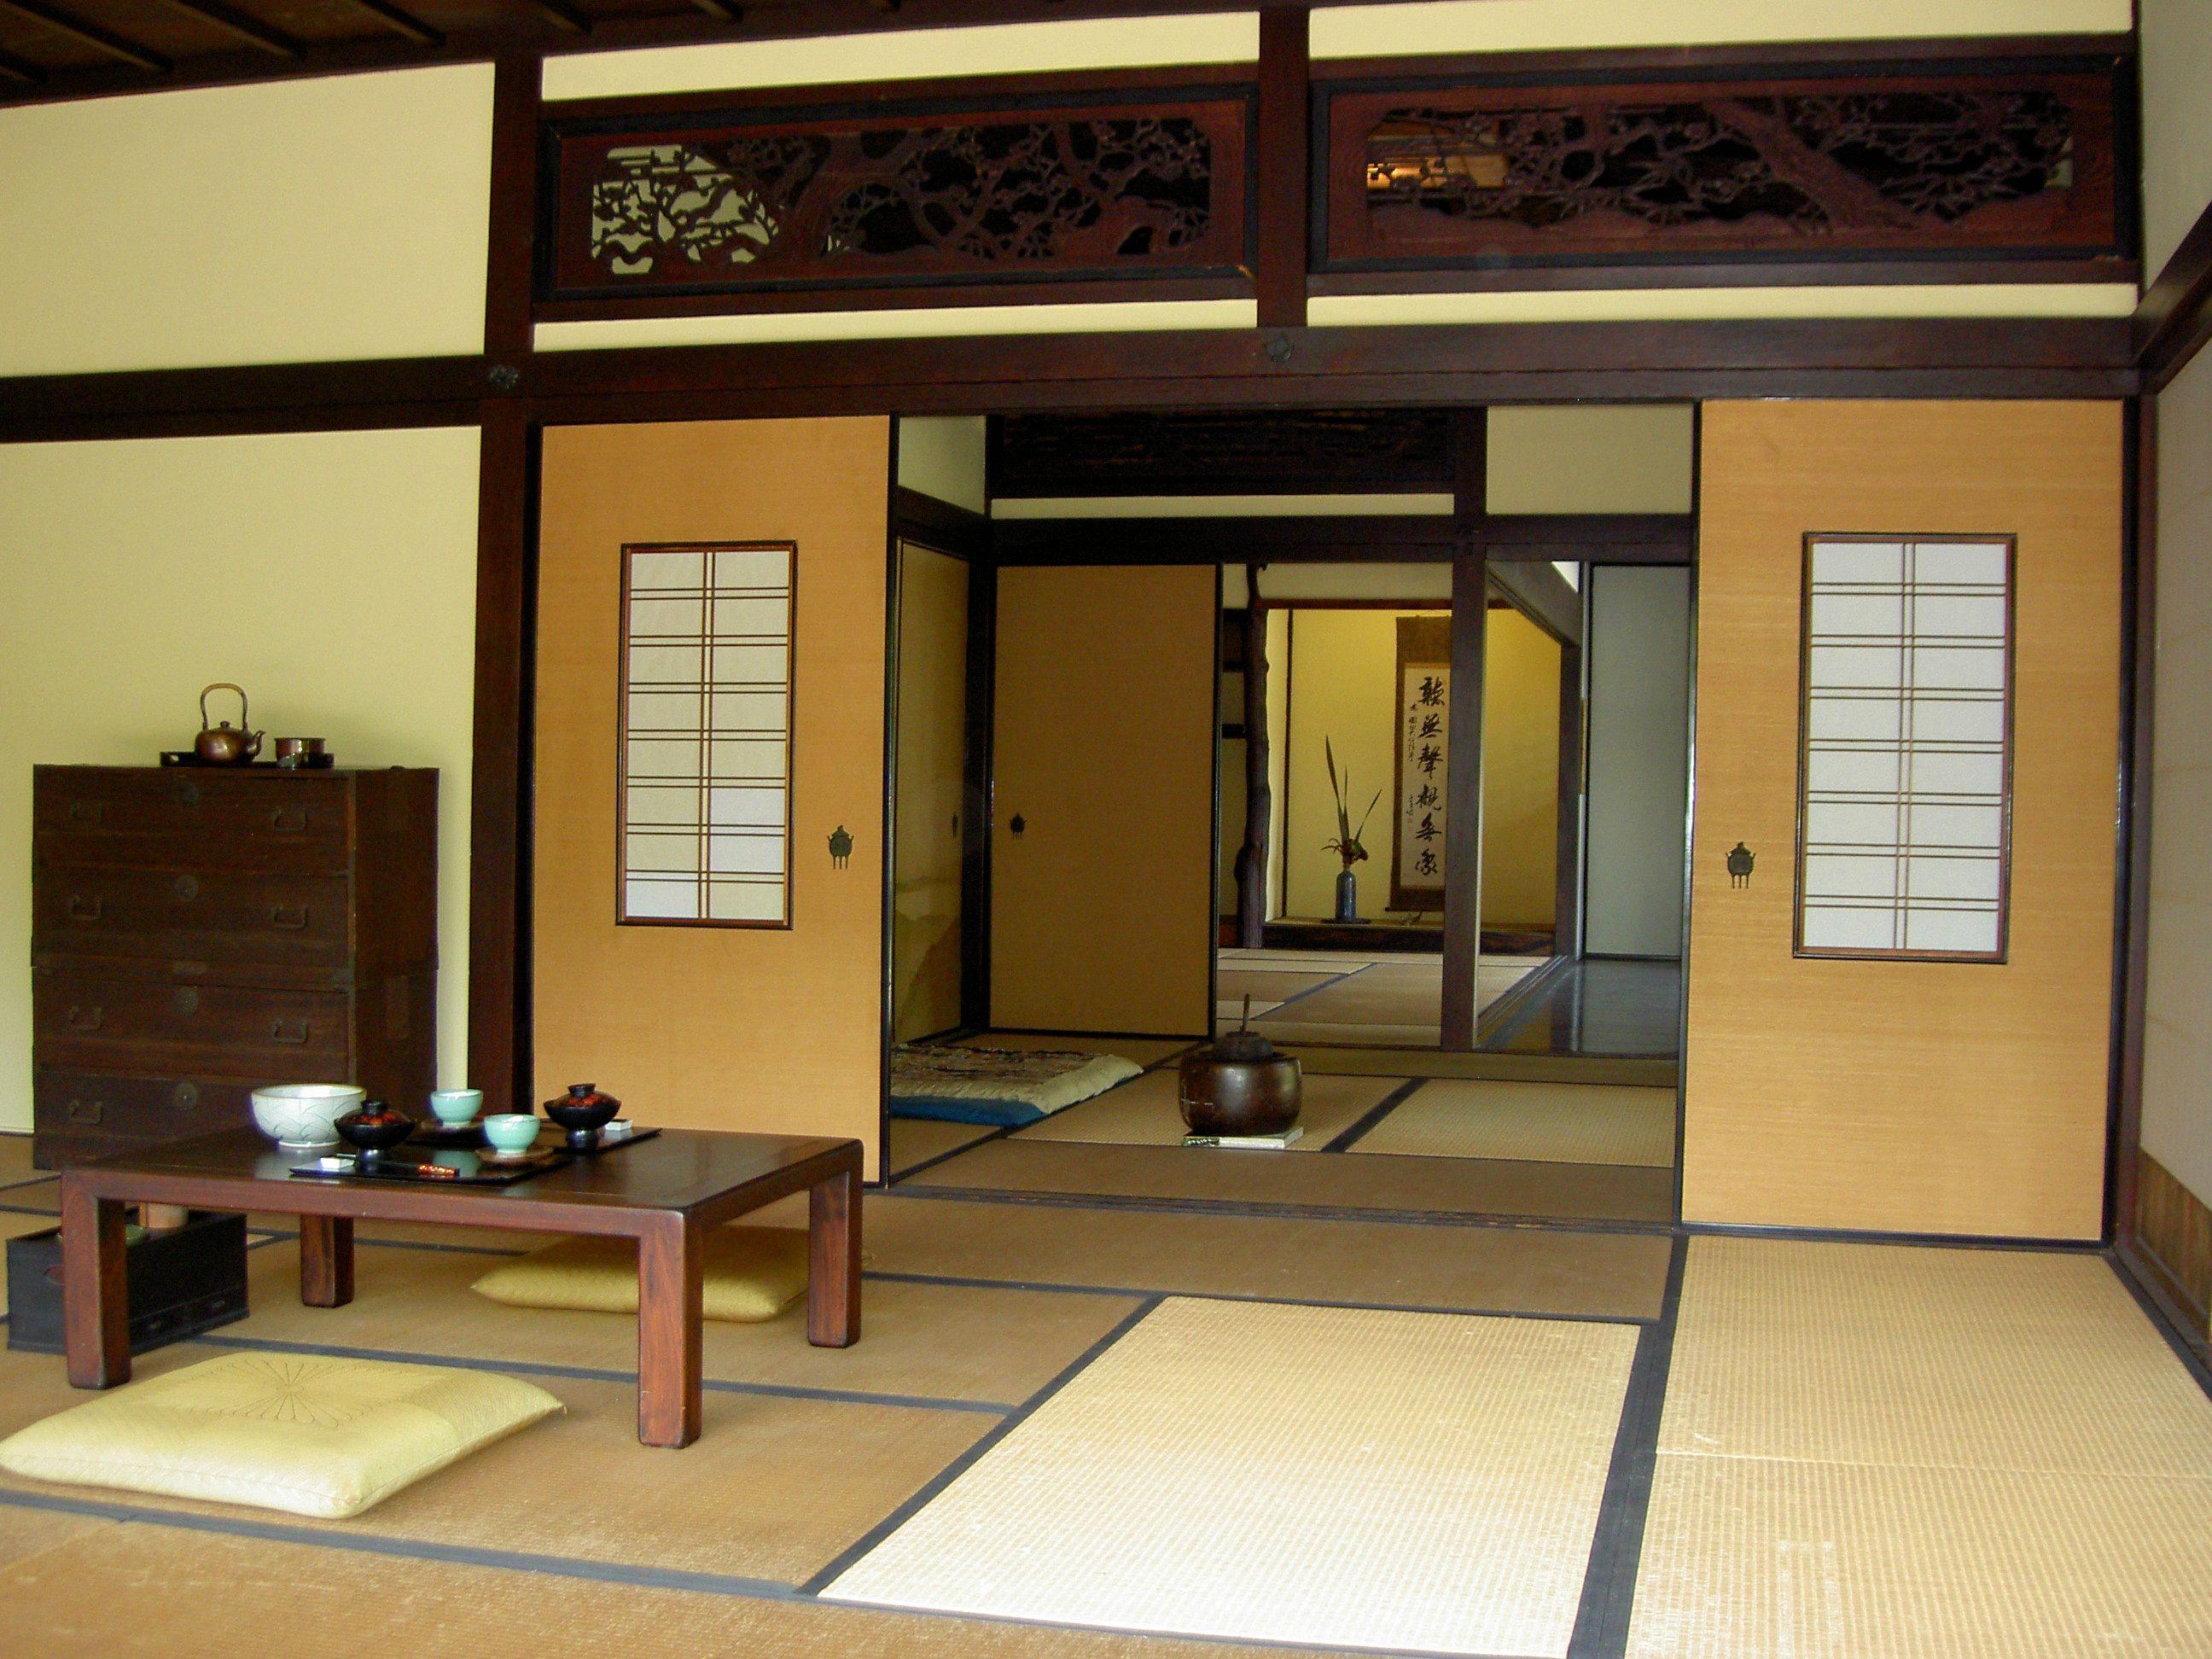 Casas japonesas dise o interior revista - Casas diseno interior ...